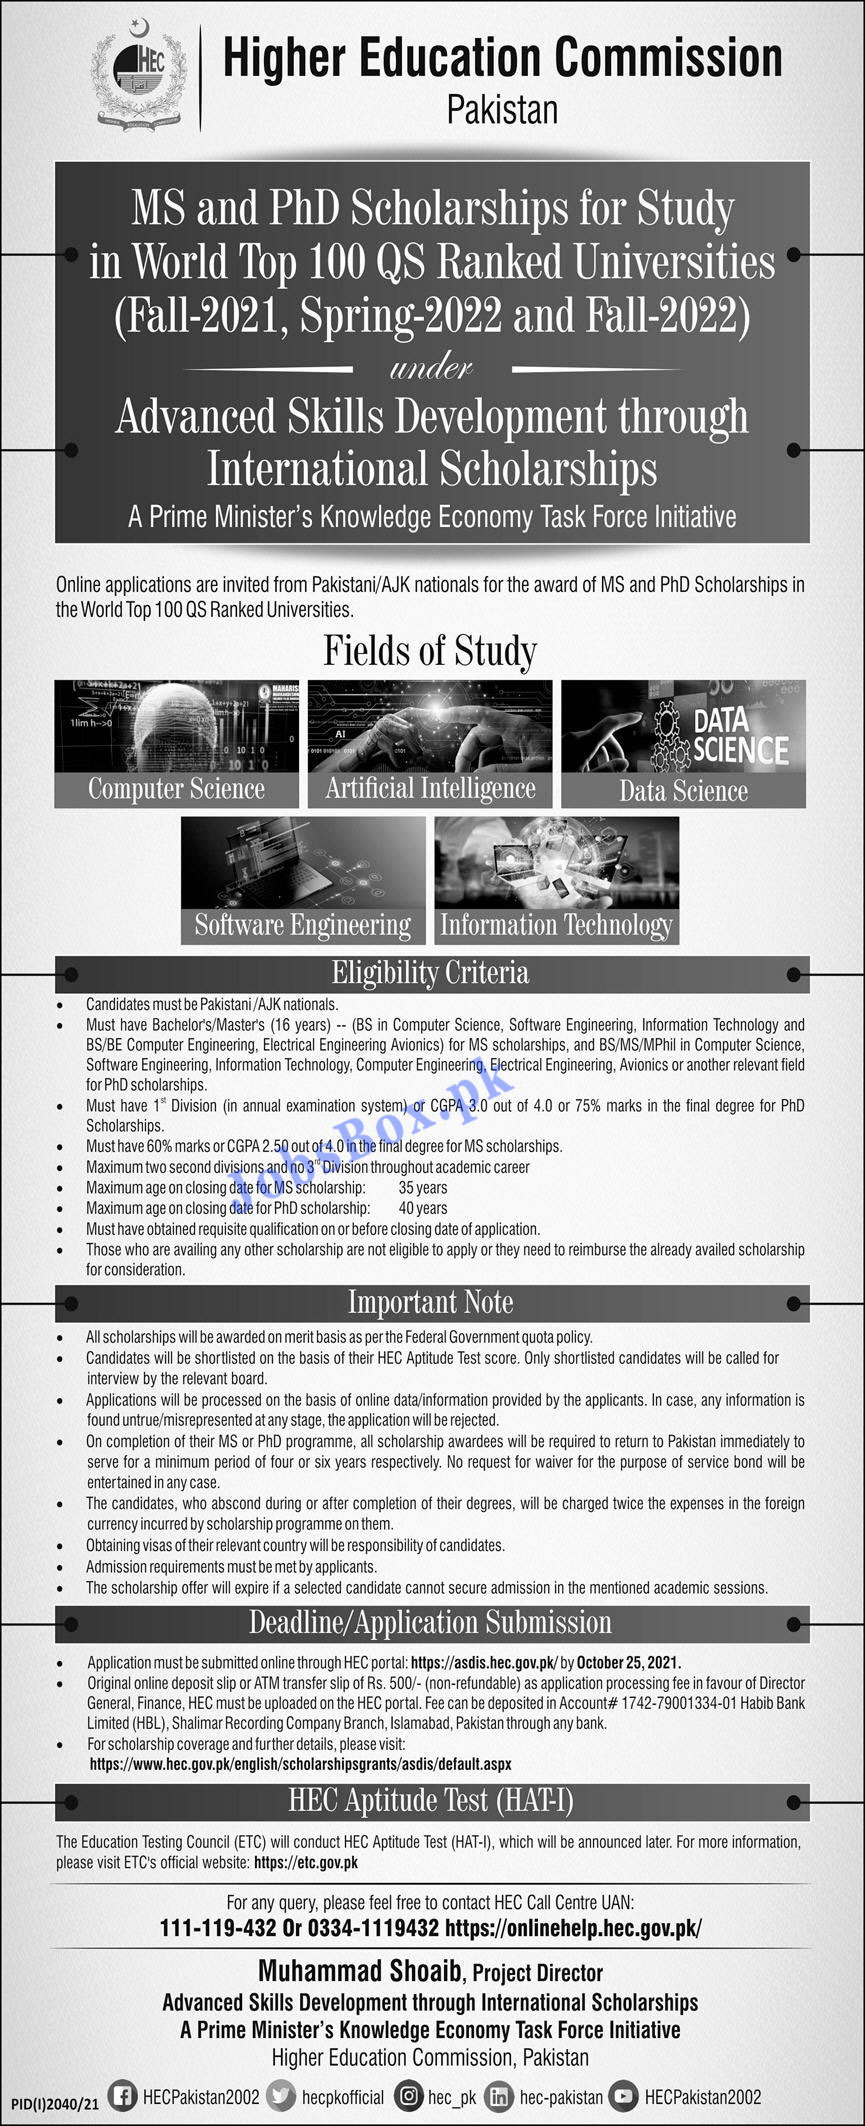 HEC MS and PhD Scholarship Program 2021 – Eportal.hec.gov.pk